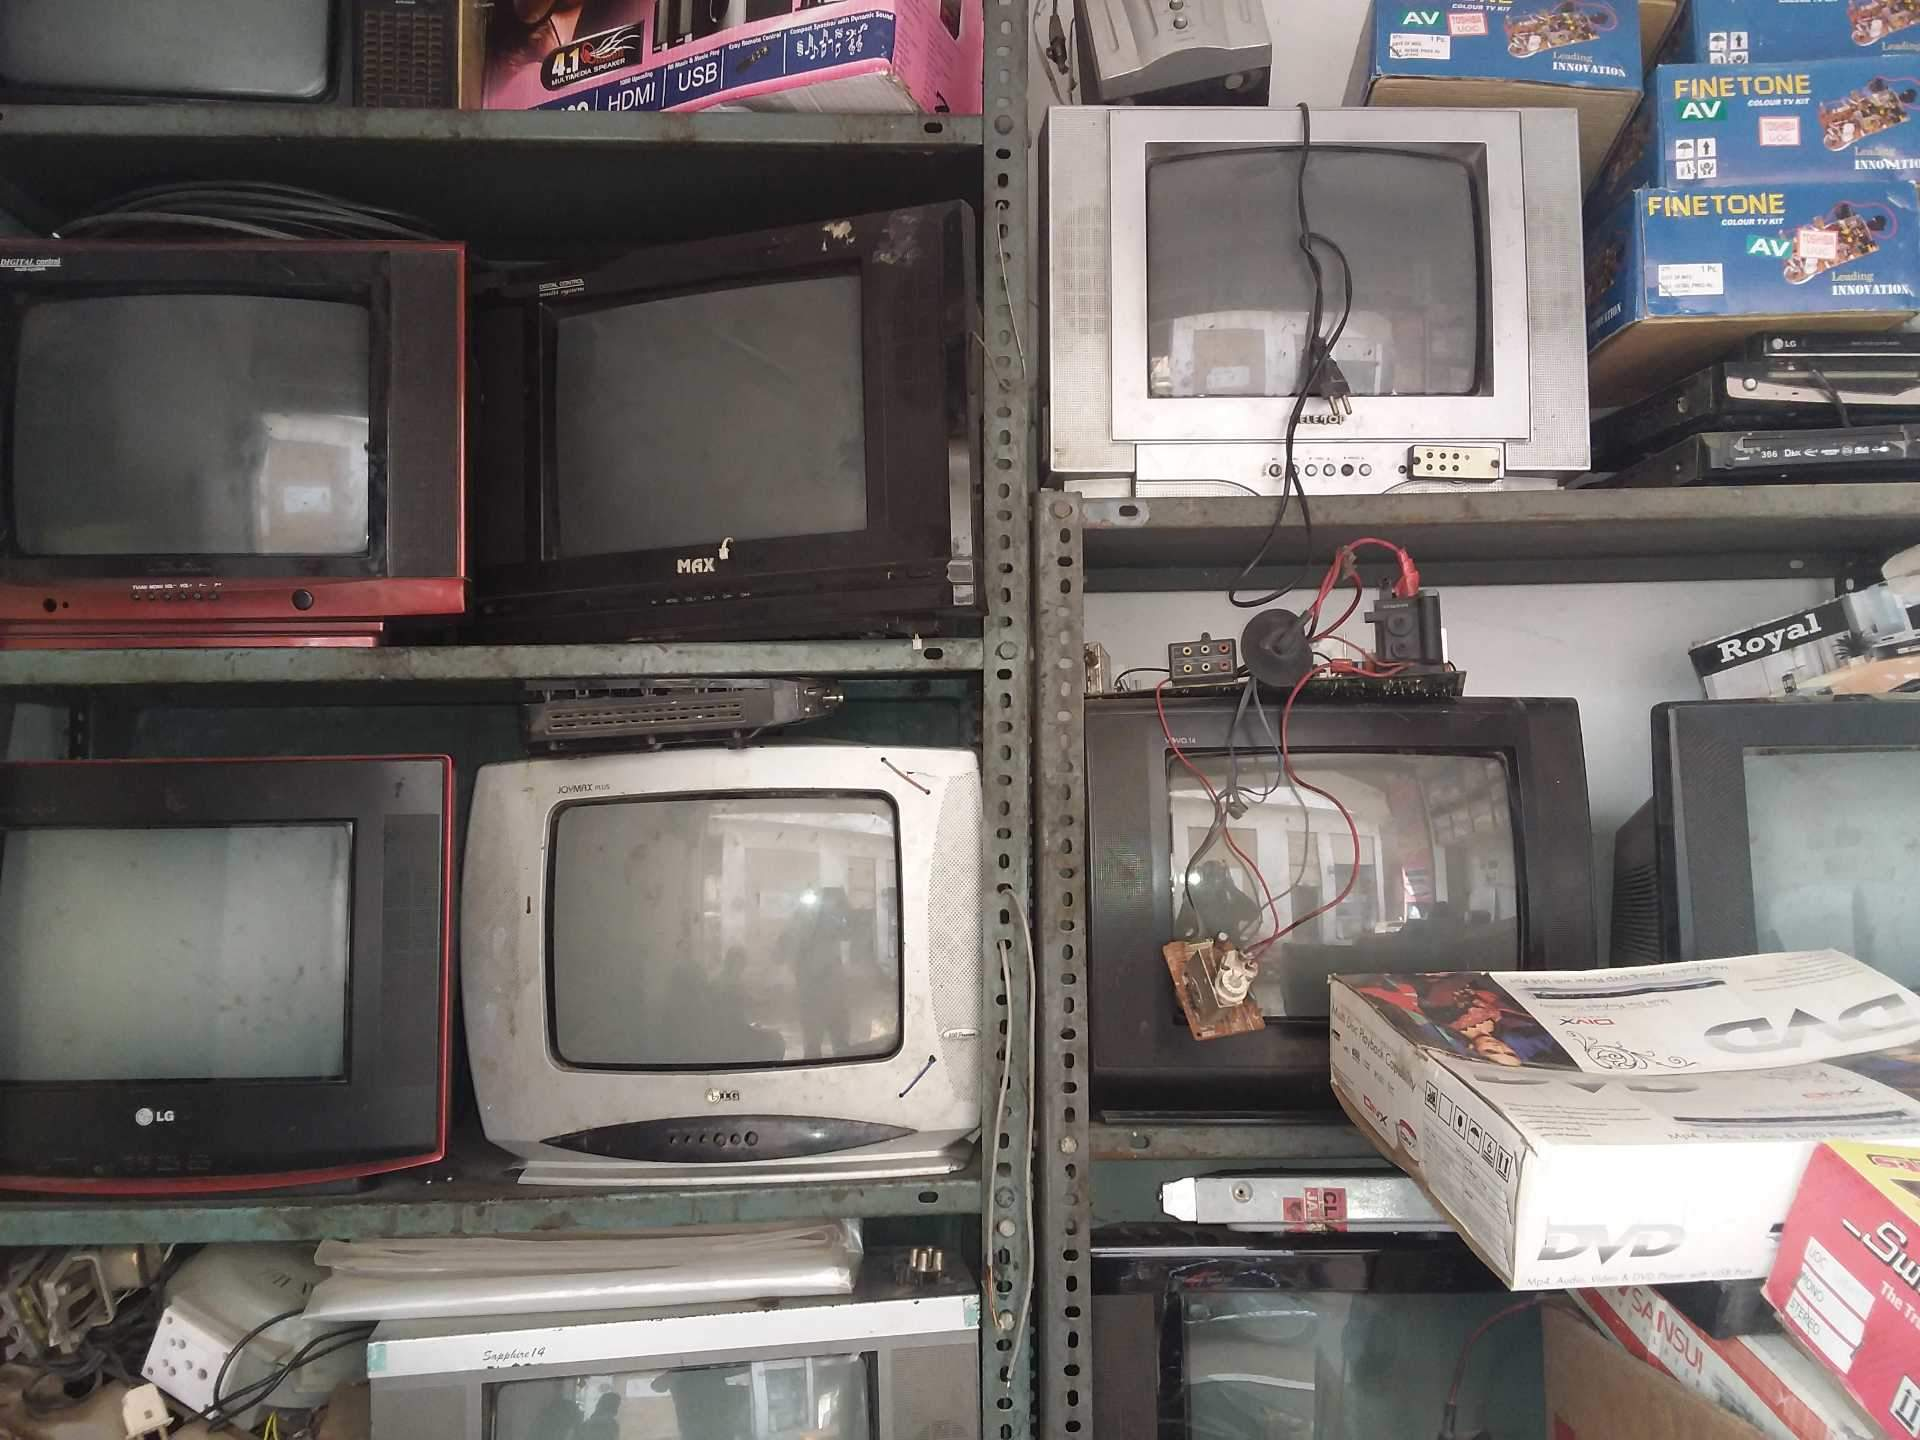 Top Tcl Tv Repair & Services in Jadcherla - Best Tcl Tv